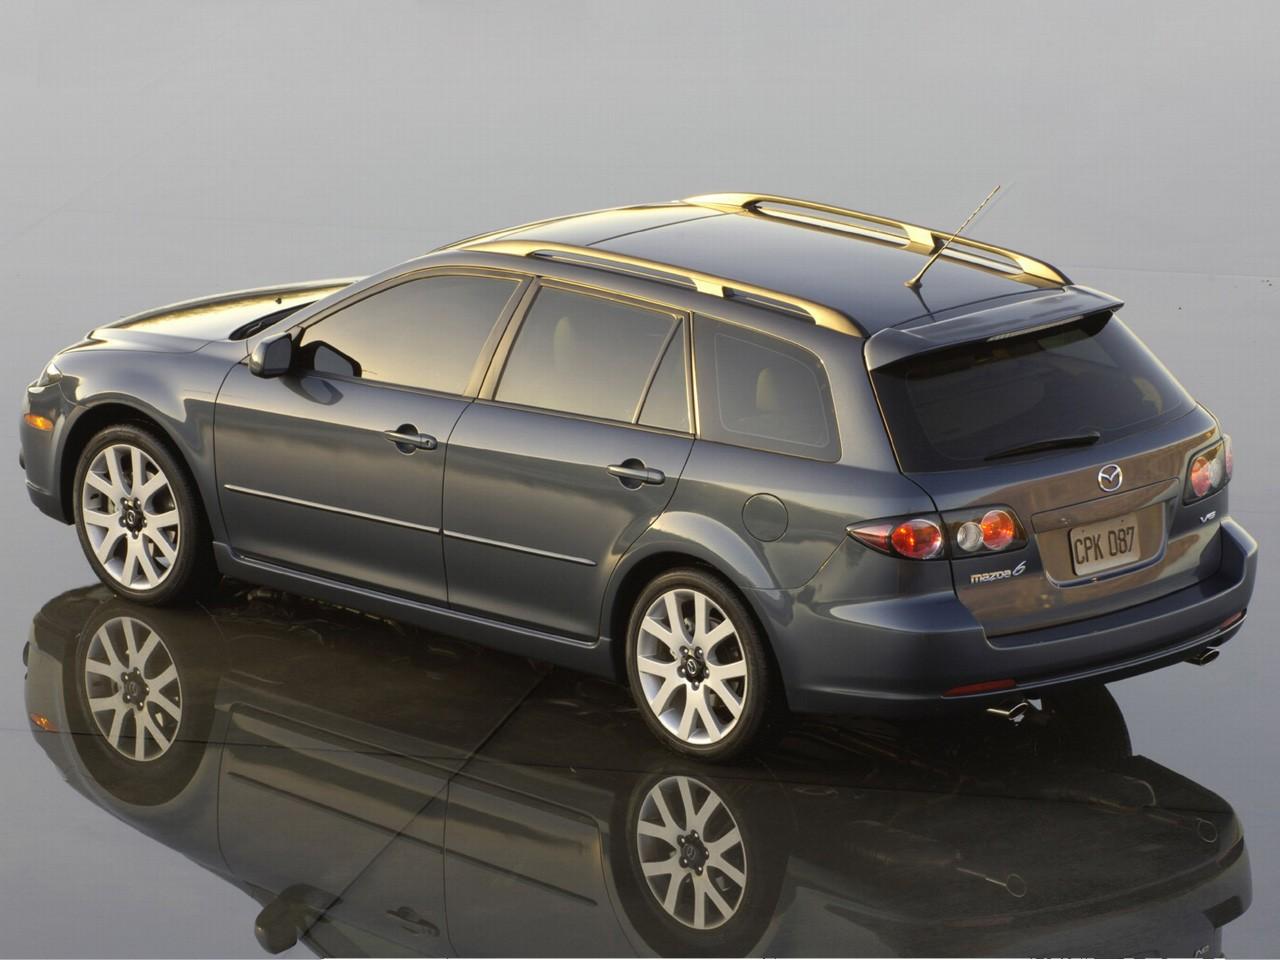 2006 Mazda3 S >> MAZDA 6/Atenza Wagon specs & photos - 2005, 2006, 2007 - autoevolution